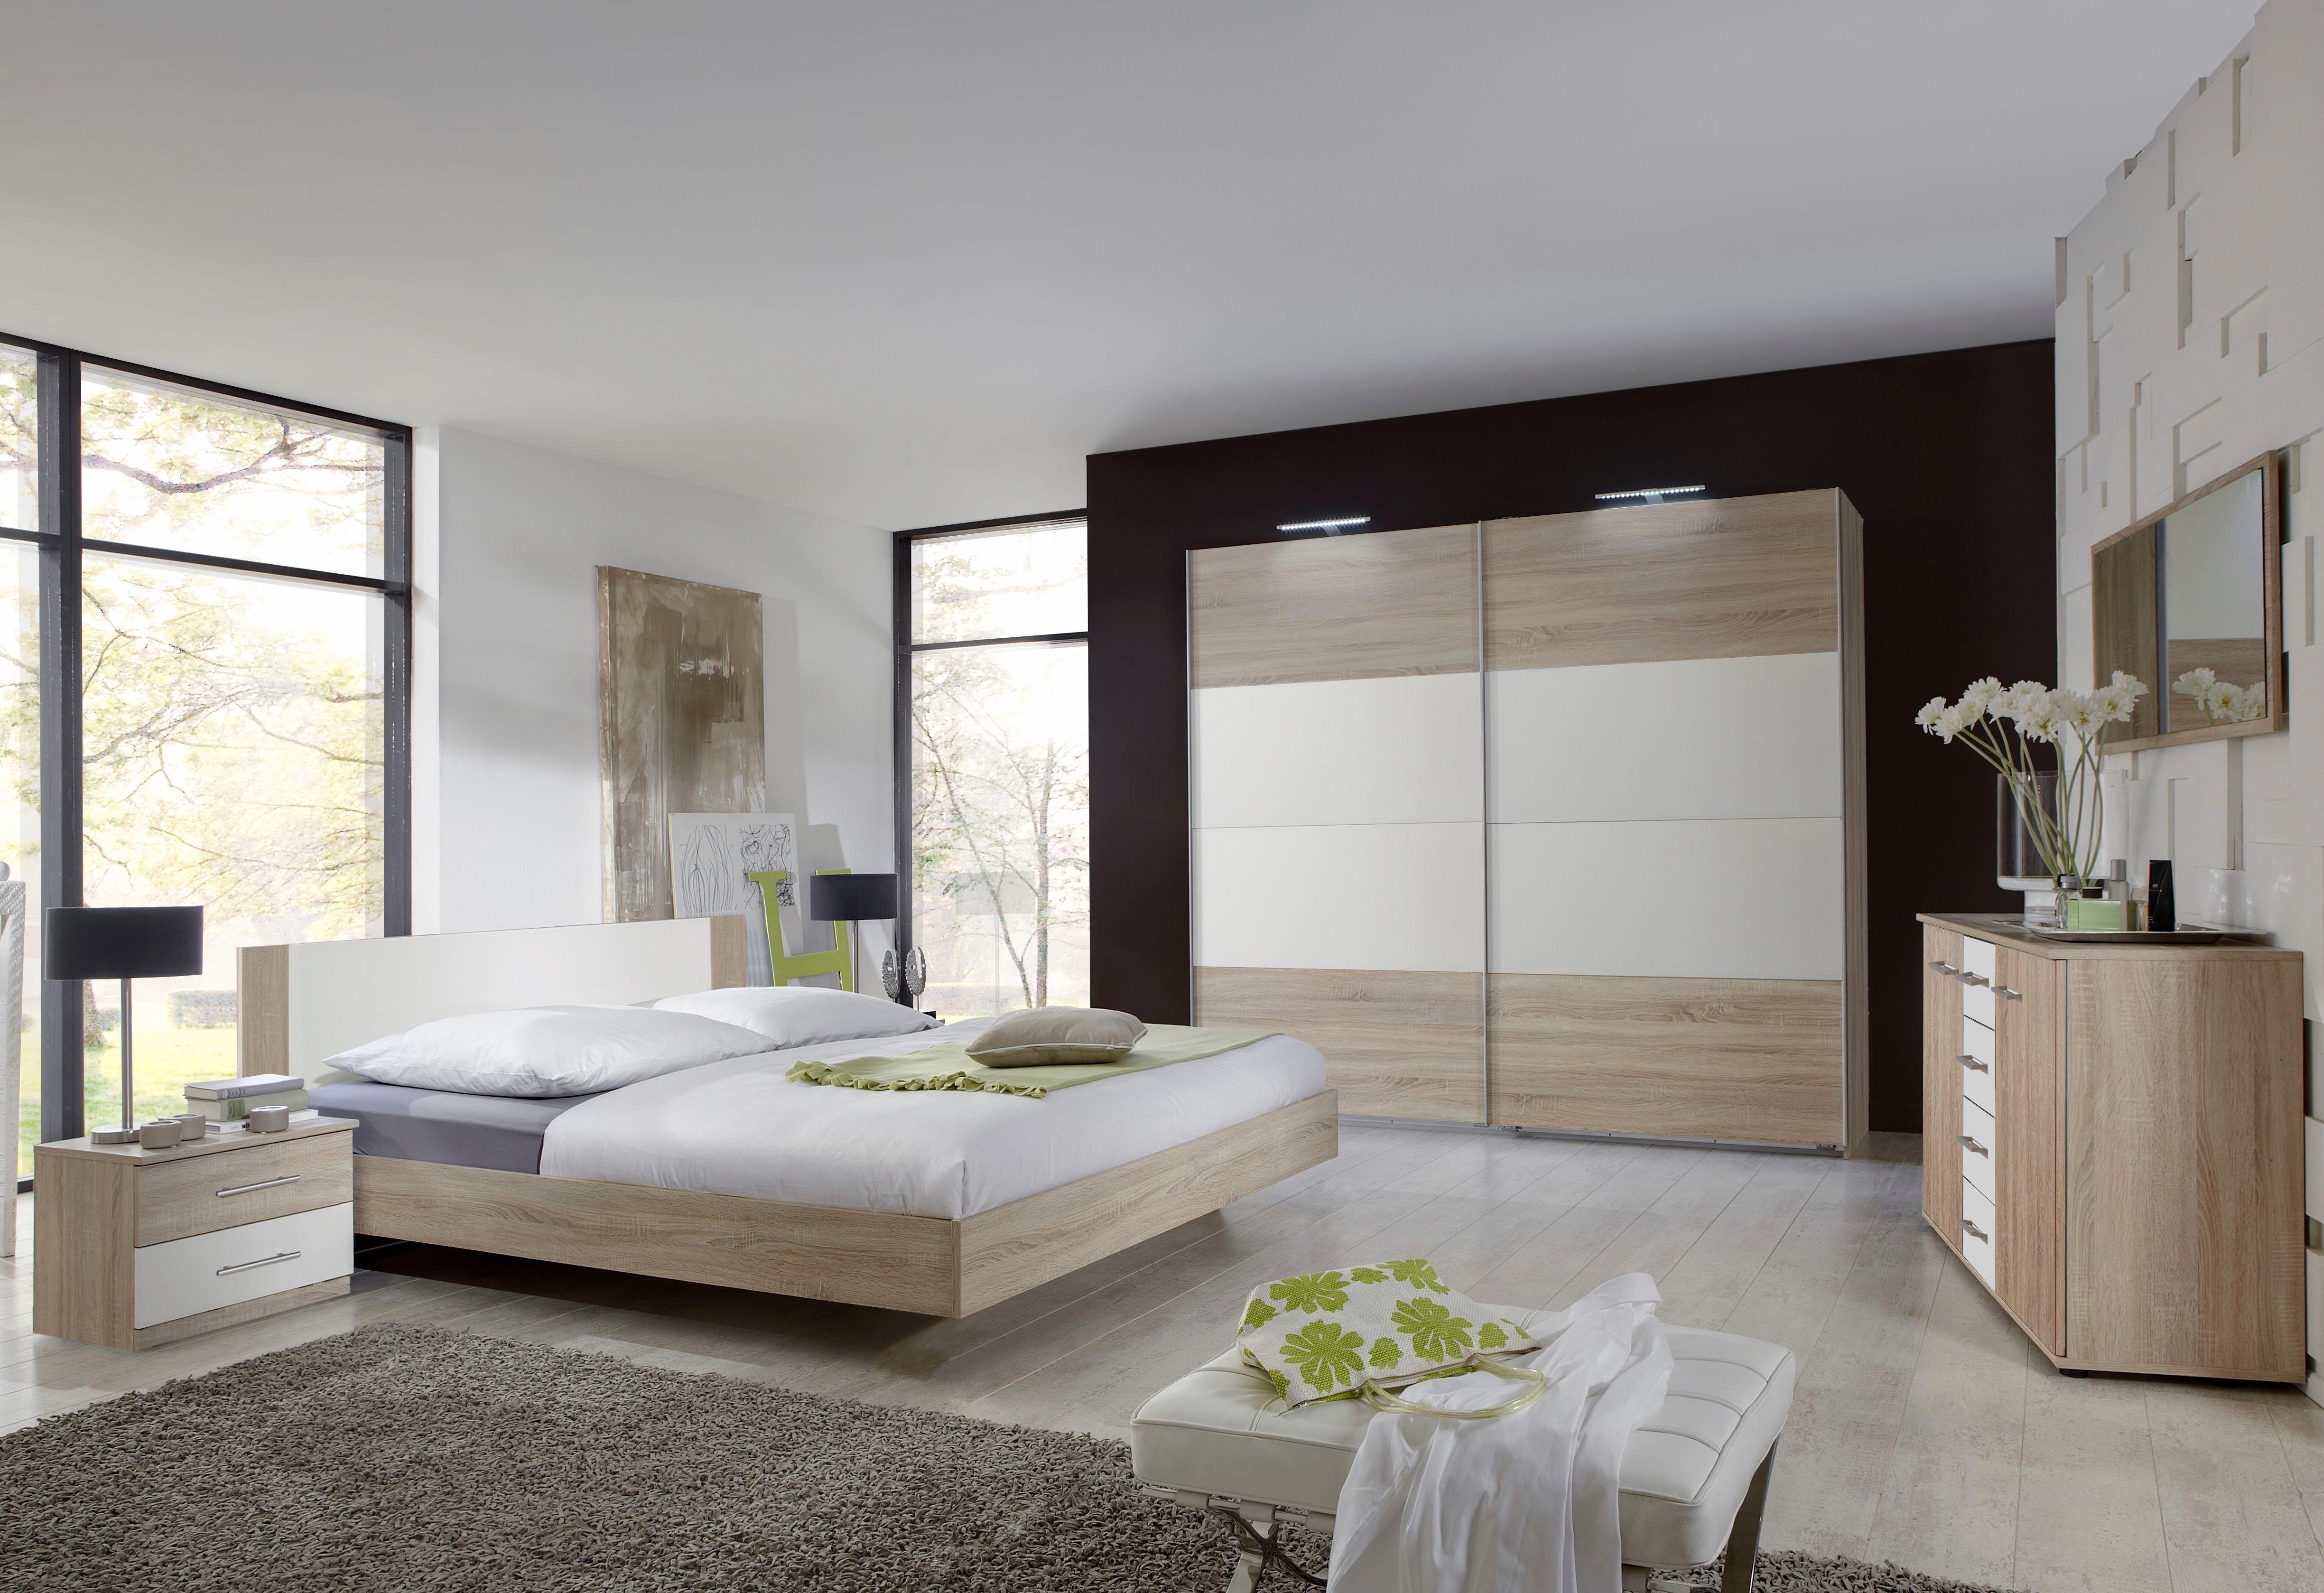 Slaapkamer Franziska in 4-delige set makkelijk besteld | OTTO